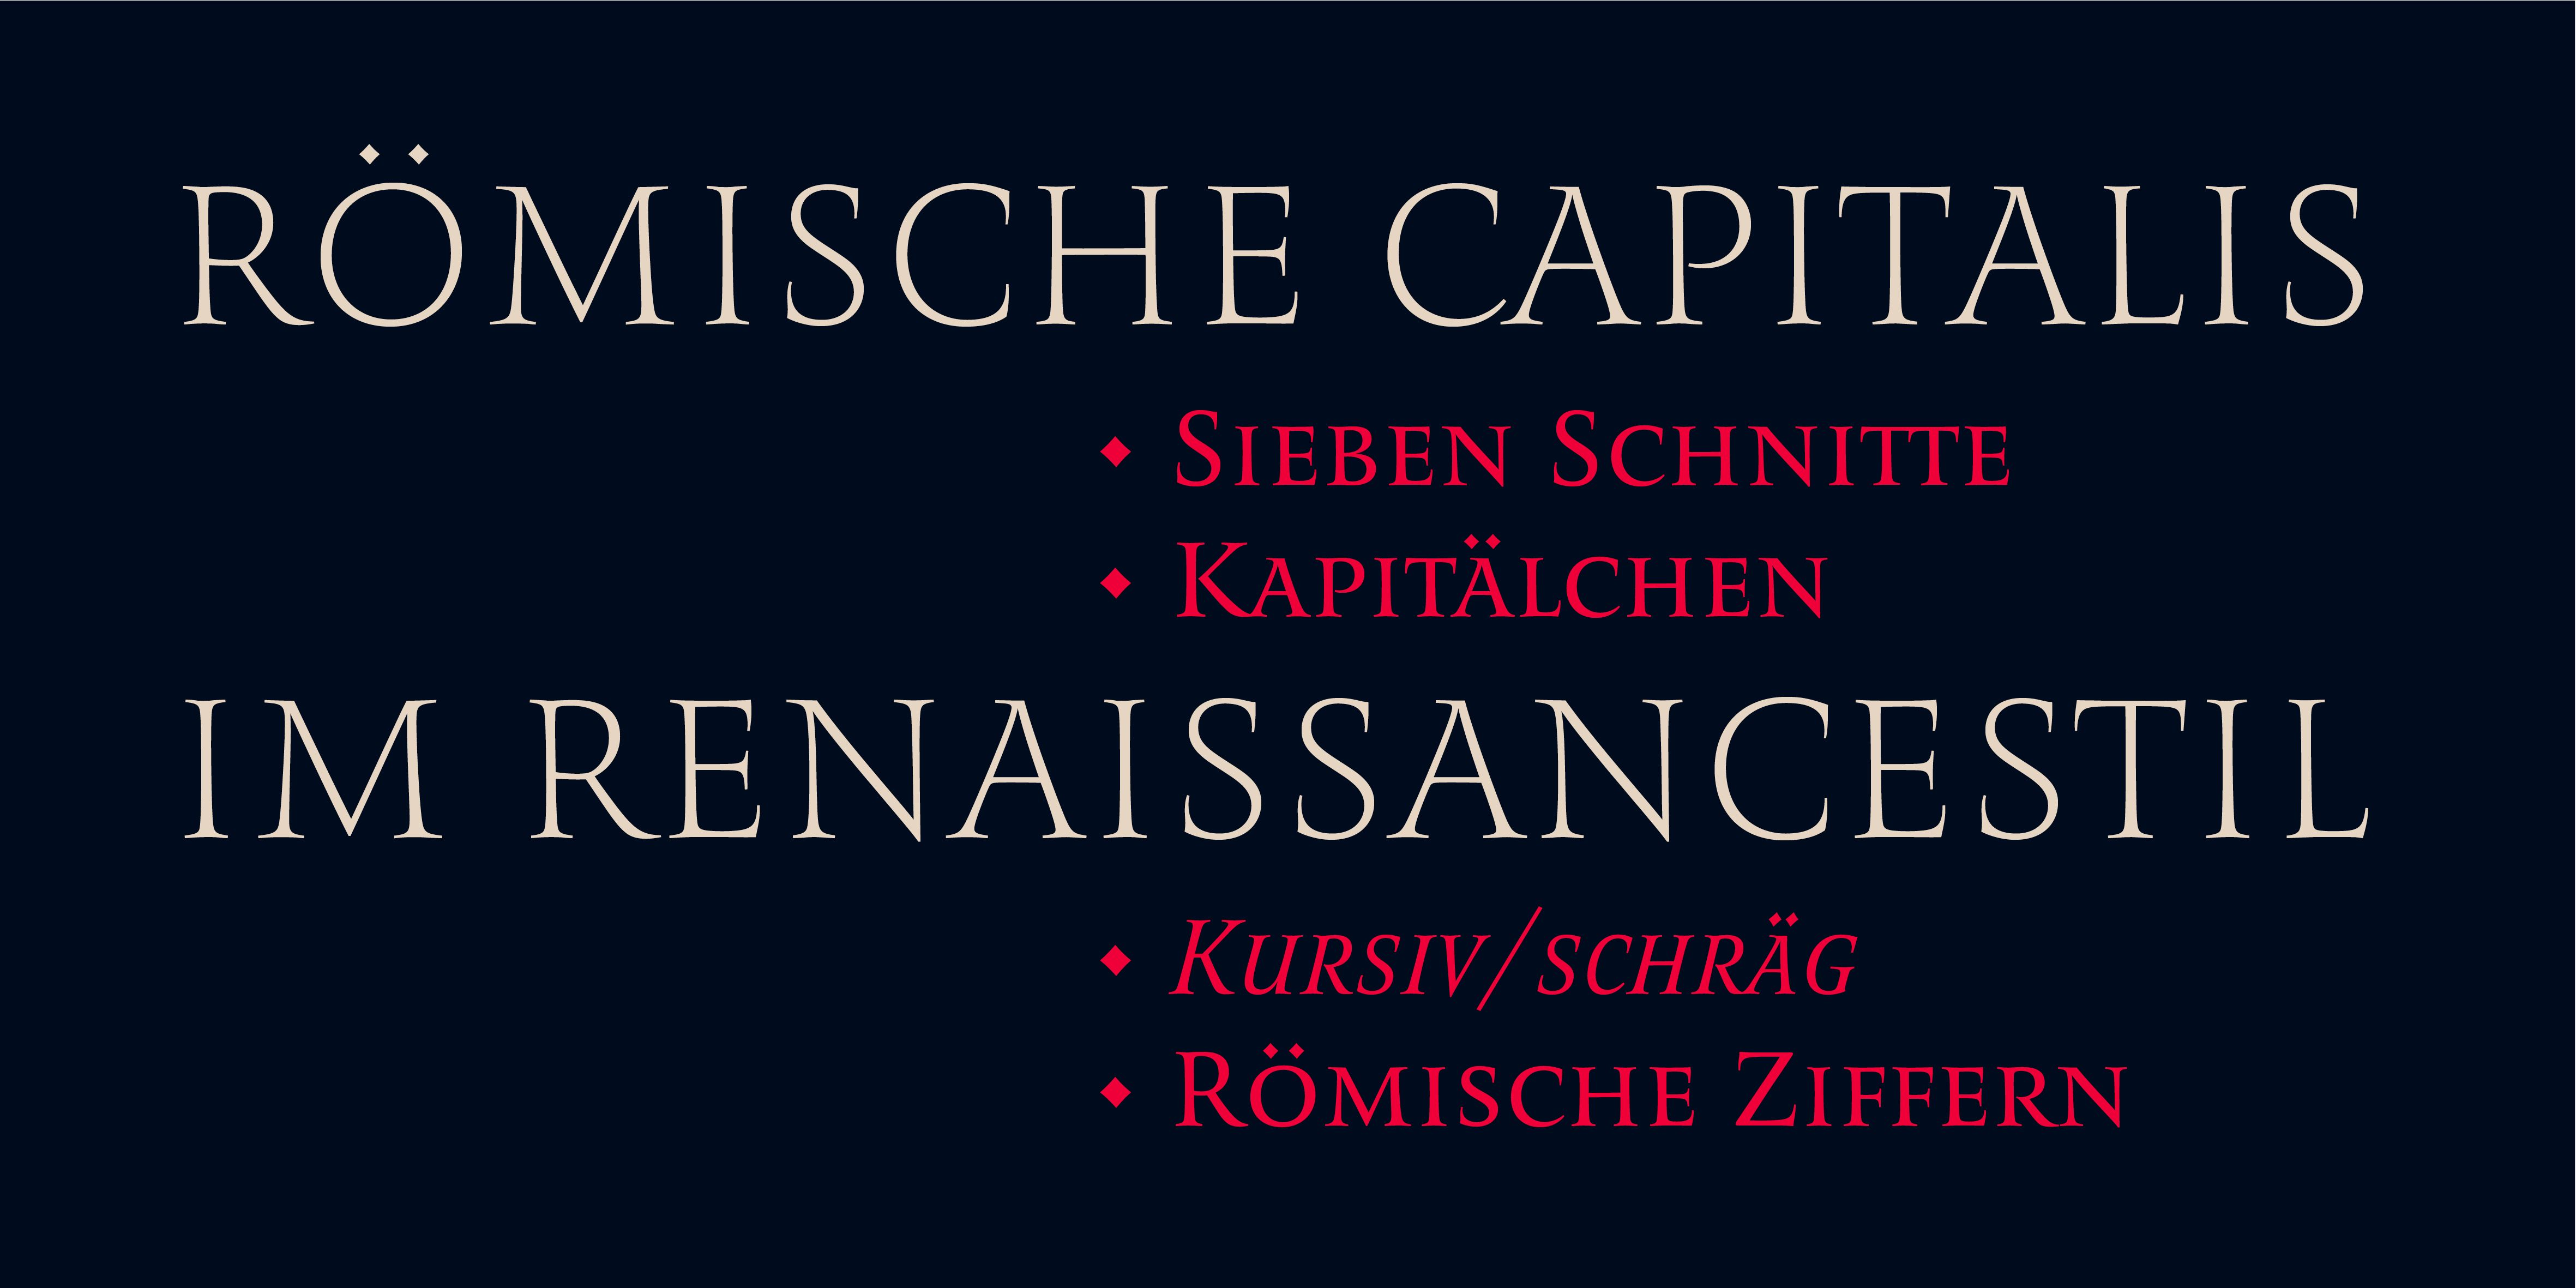 Poster: Römische Capitalis im Renaissancestil